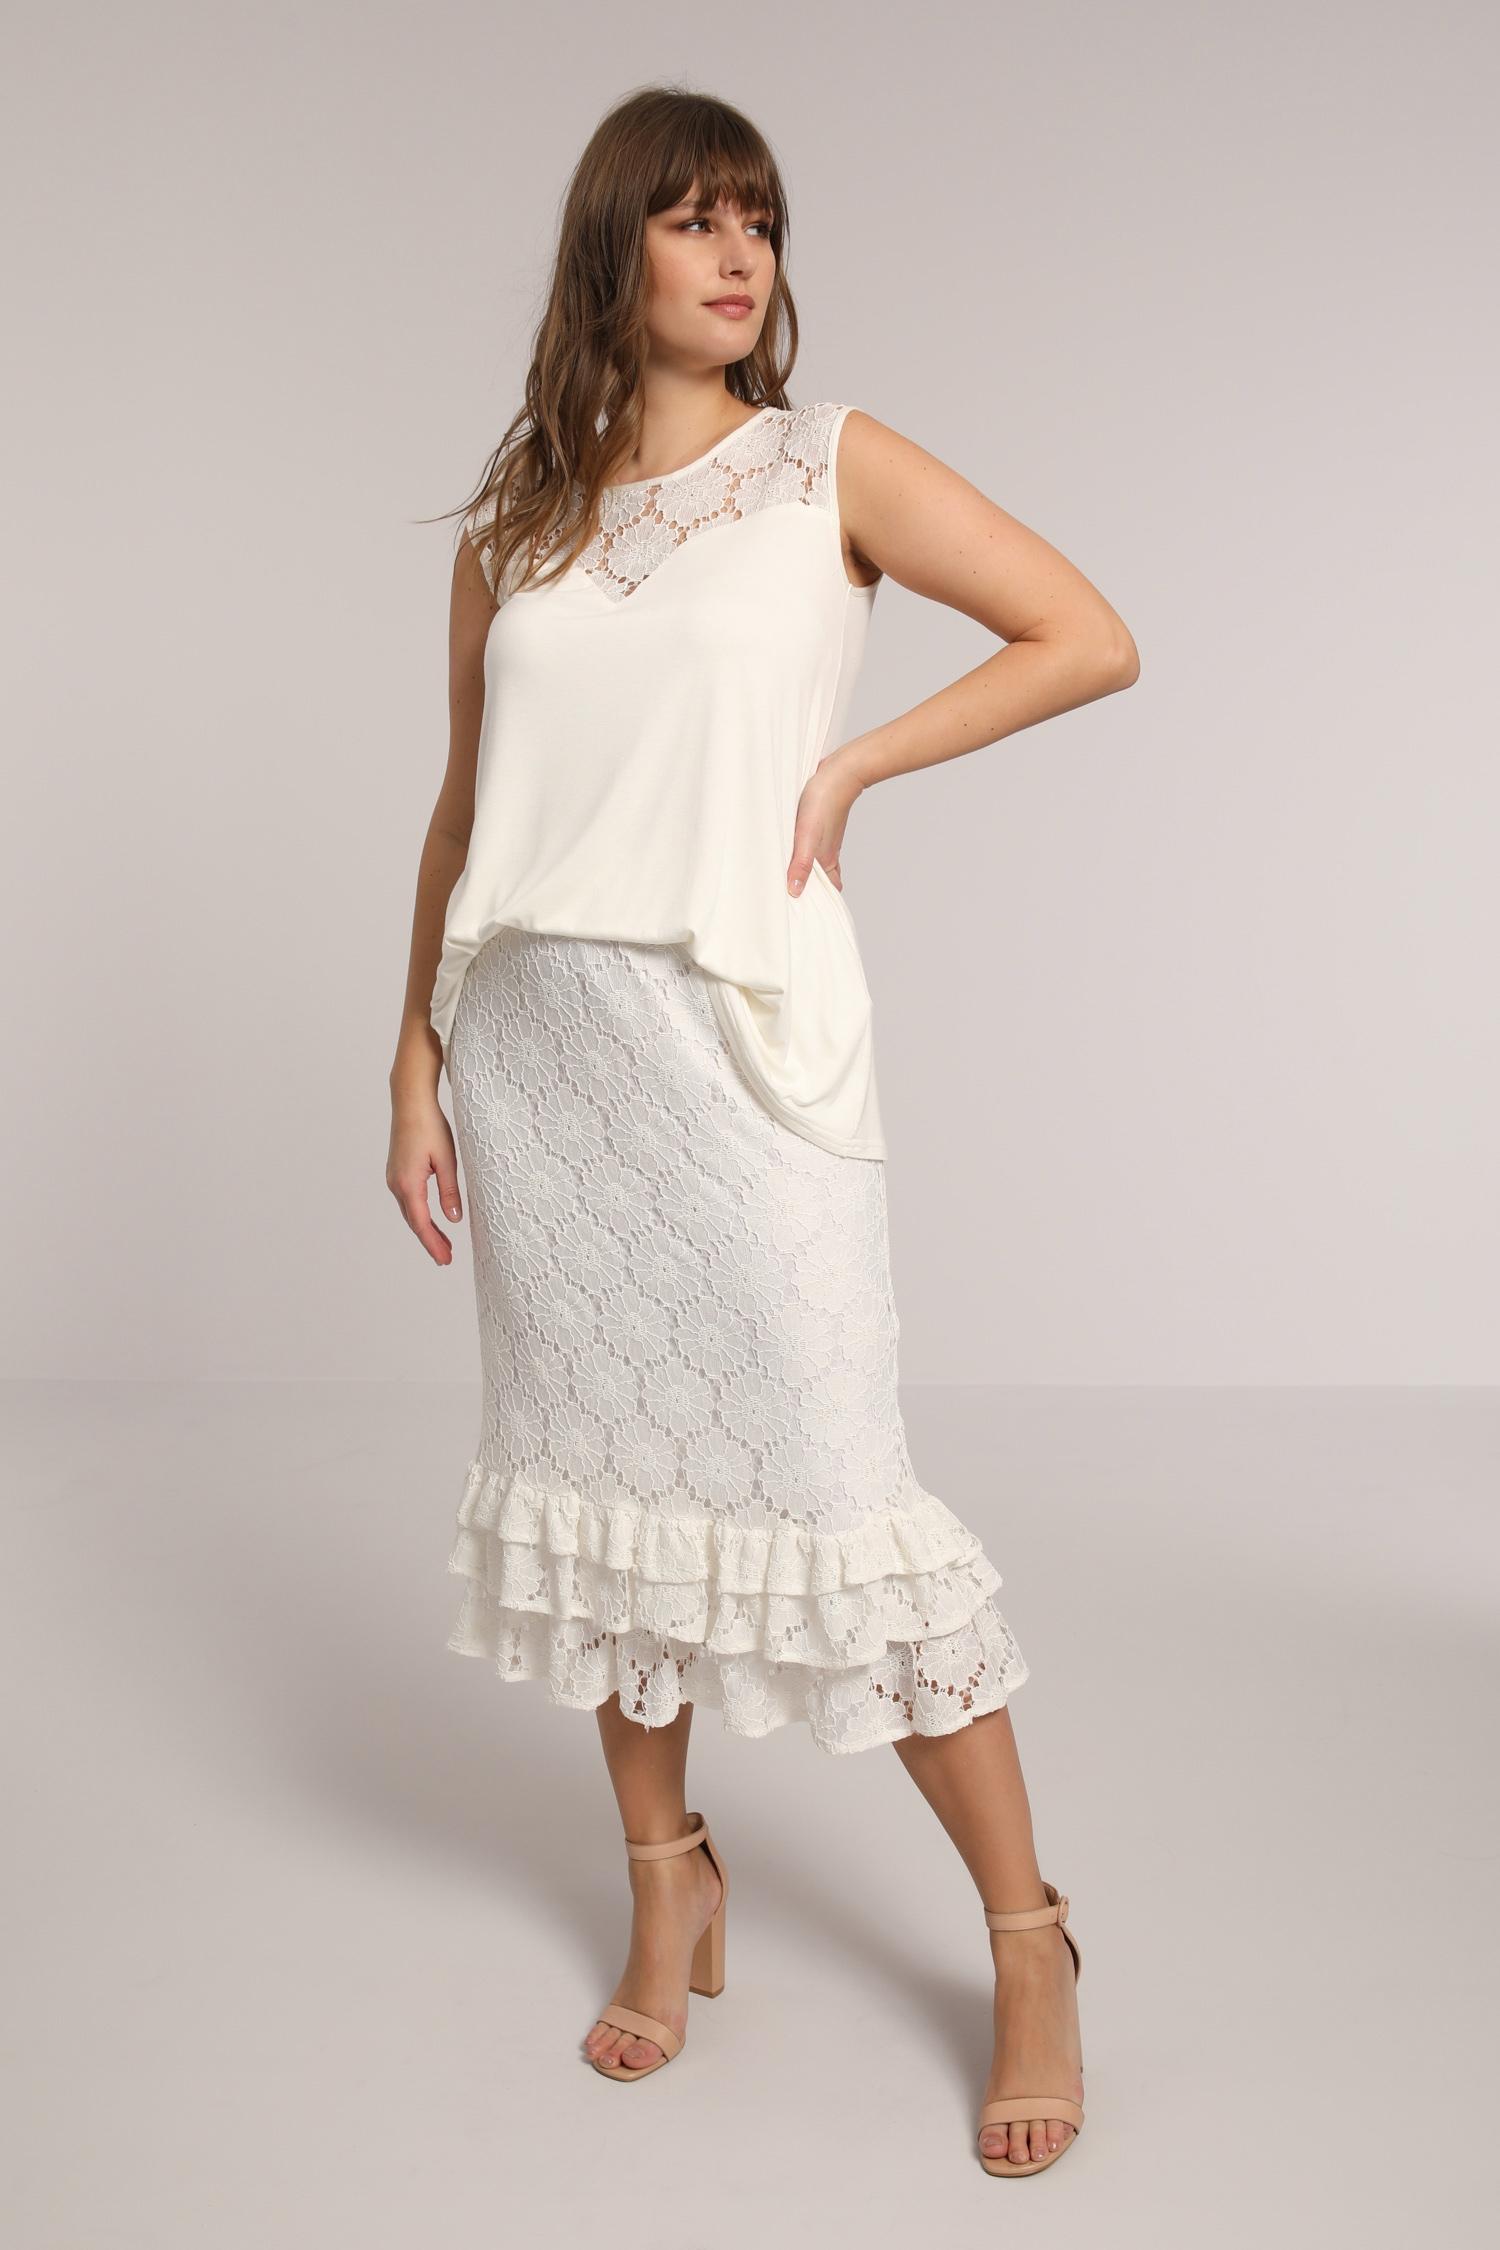 Lace petticoat